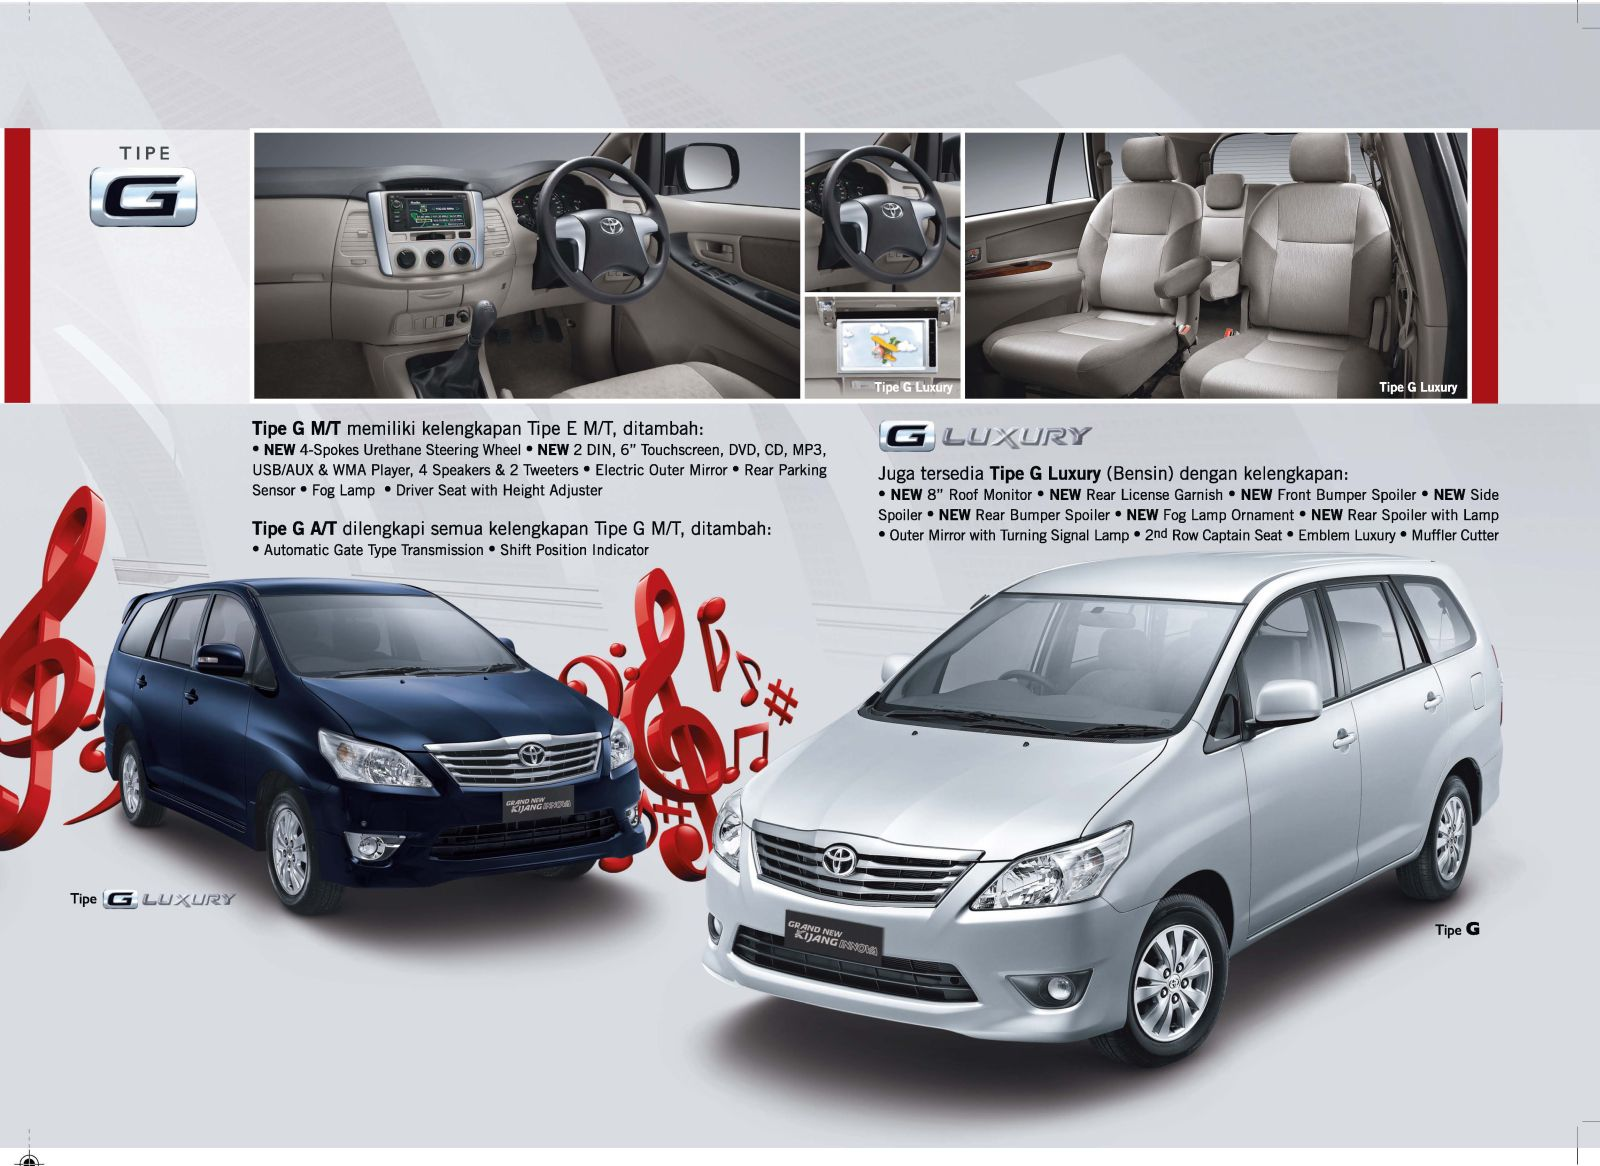 Grand New Avanza Tipe E Abs Warna 2018 Brosur Kijang Innova Pesta Diskon Toyota